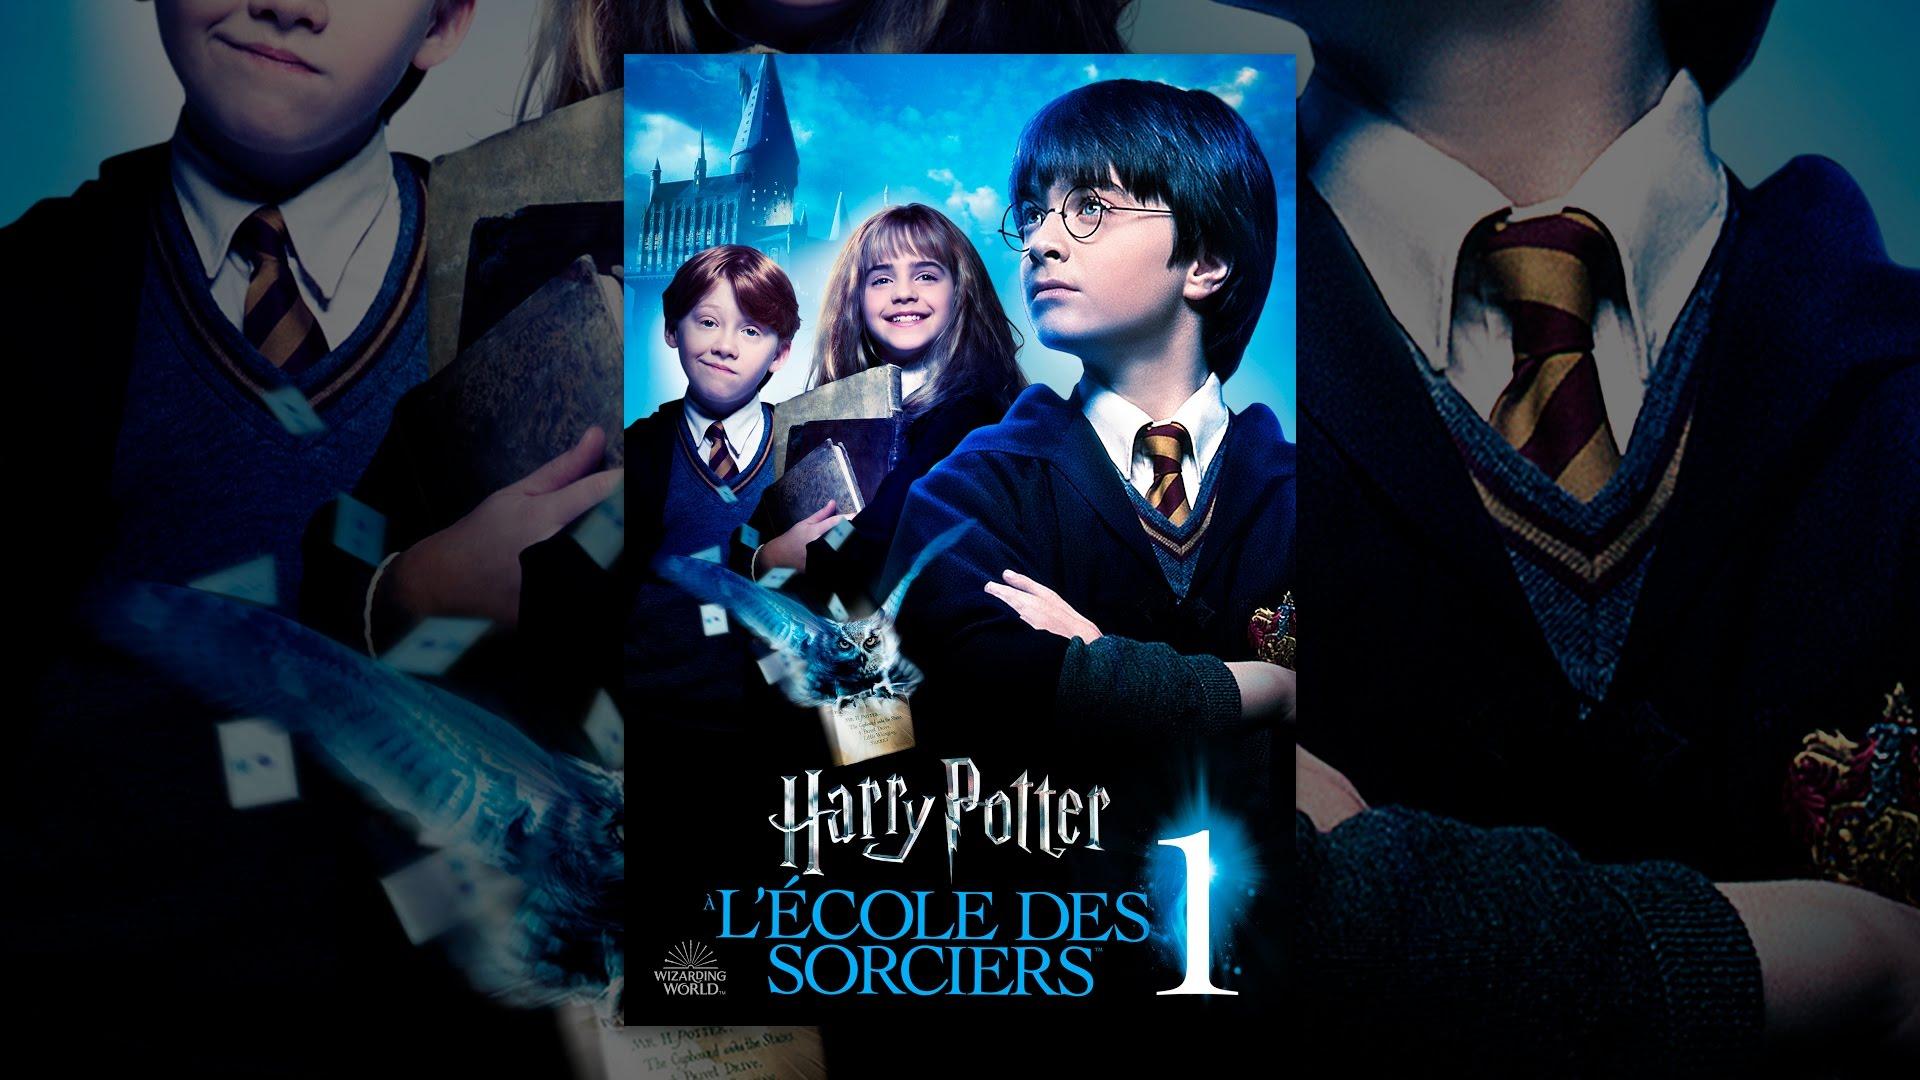 Harry Potter (character) - Wikipedia